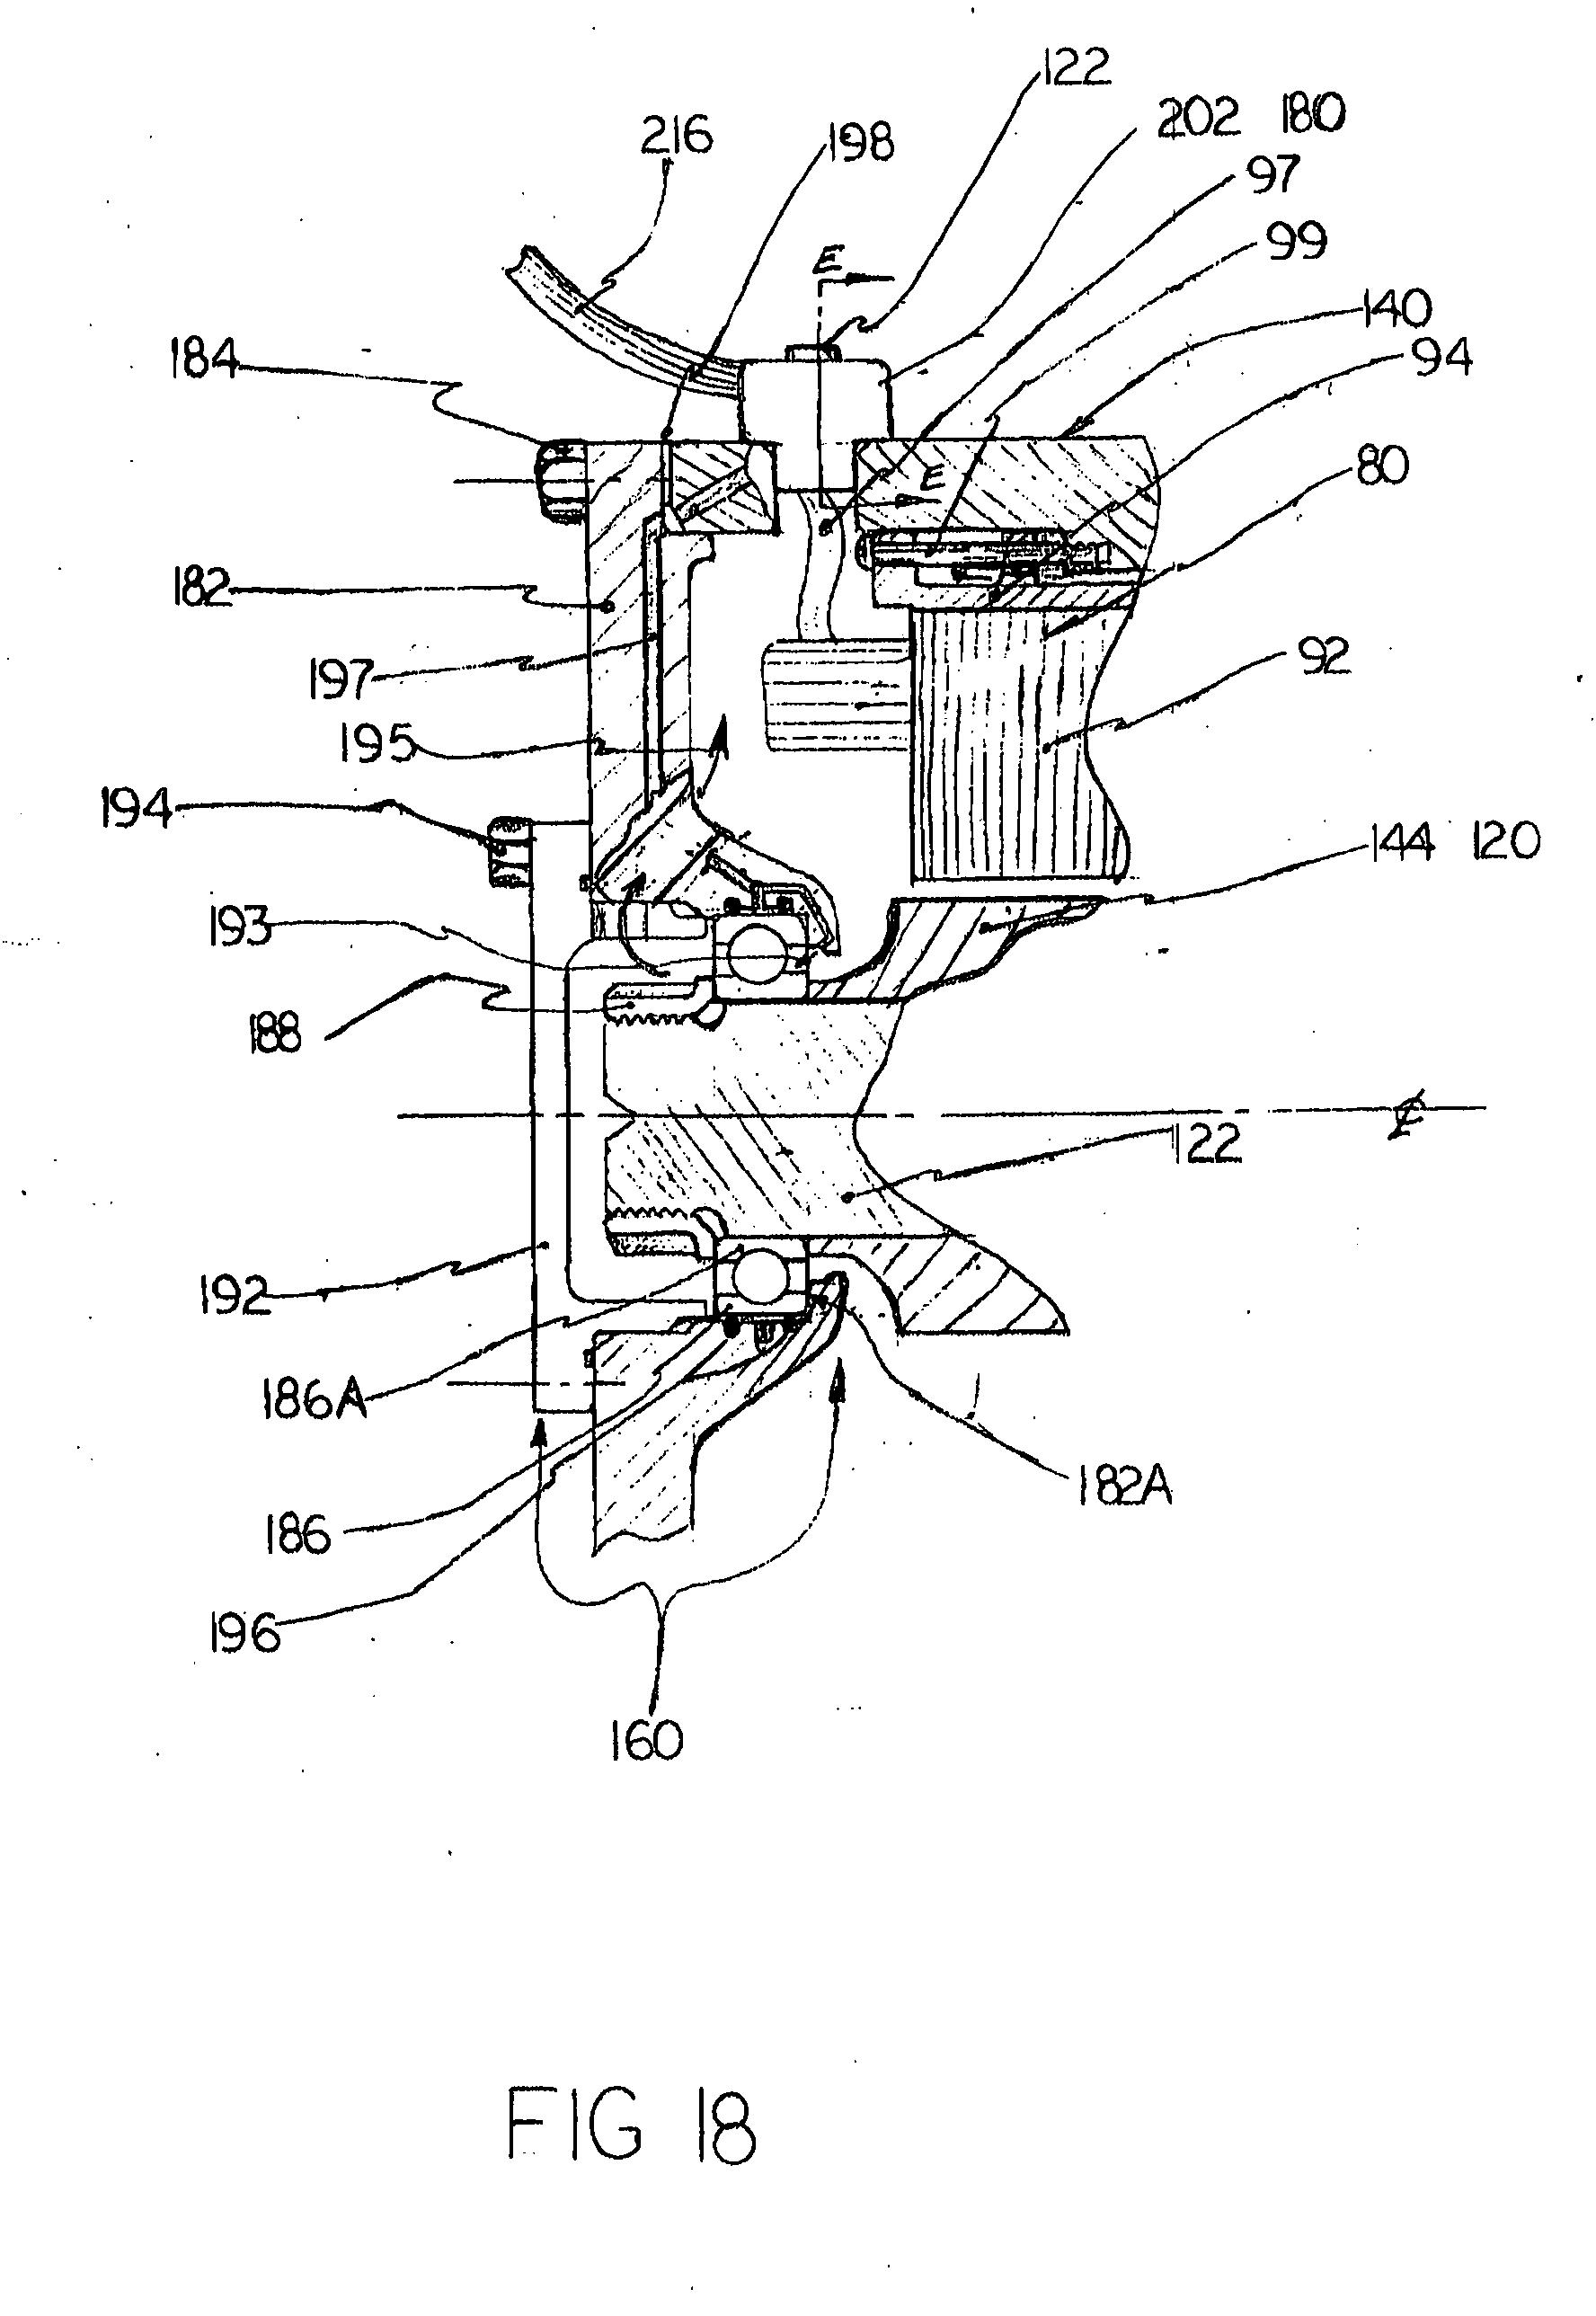 avco gm alternator wire diagram  gm  auto wiring diagram